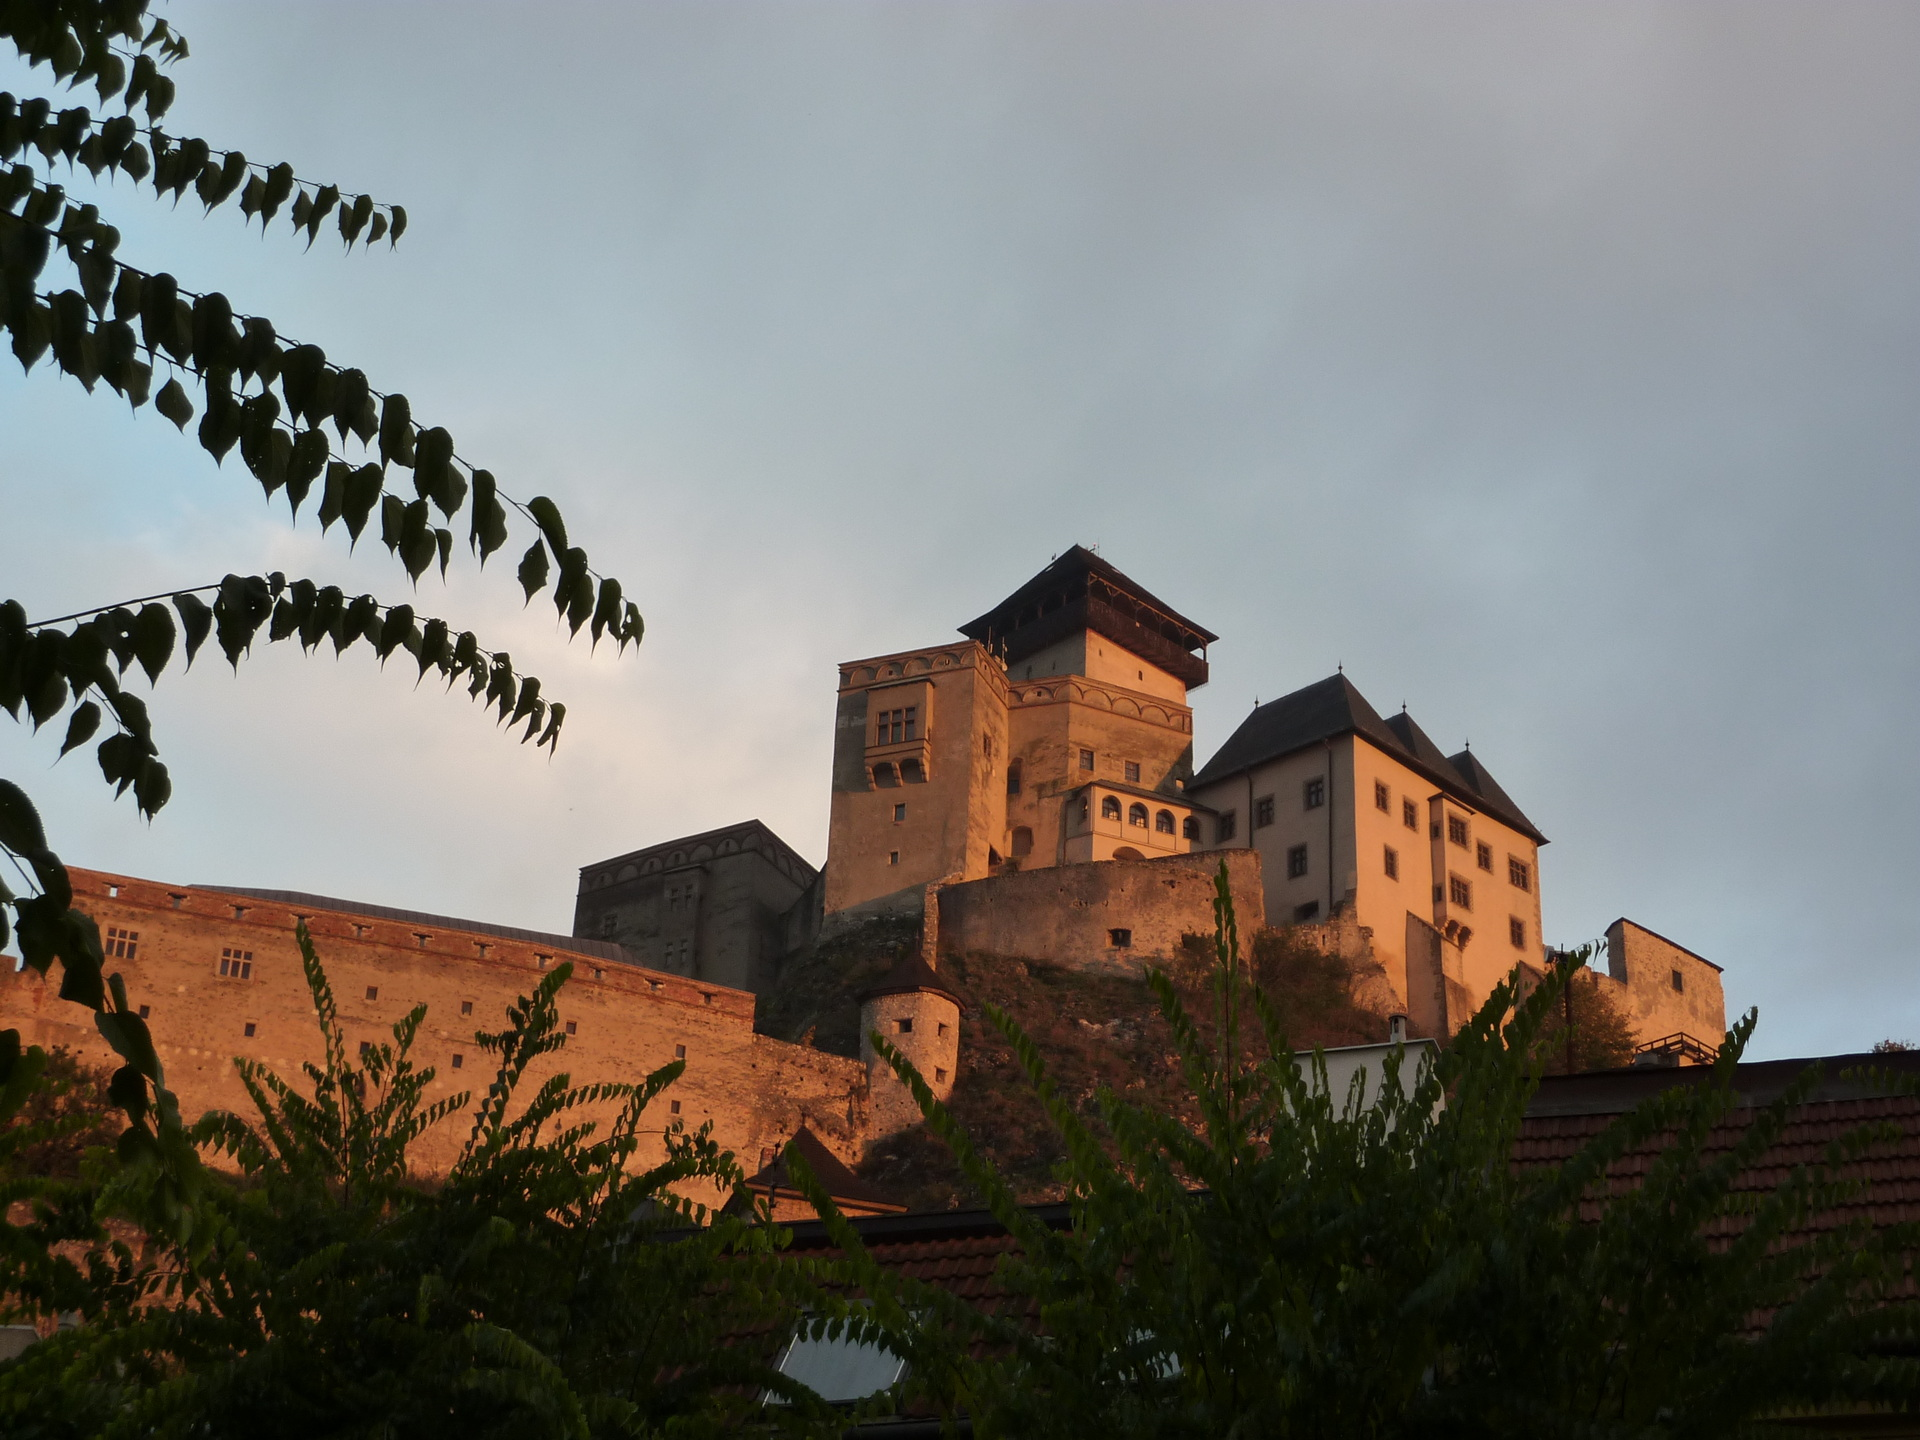 Die Burg in Martin (SK)